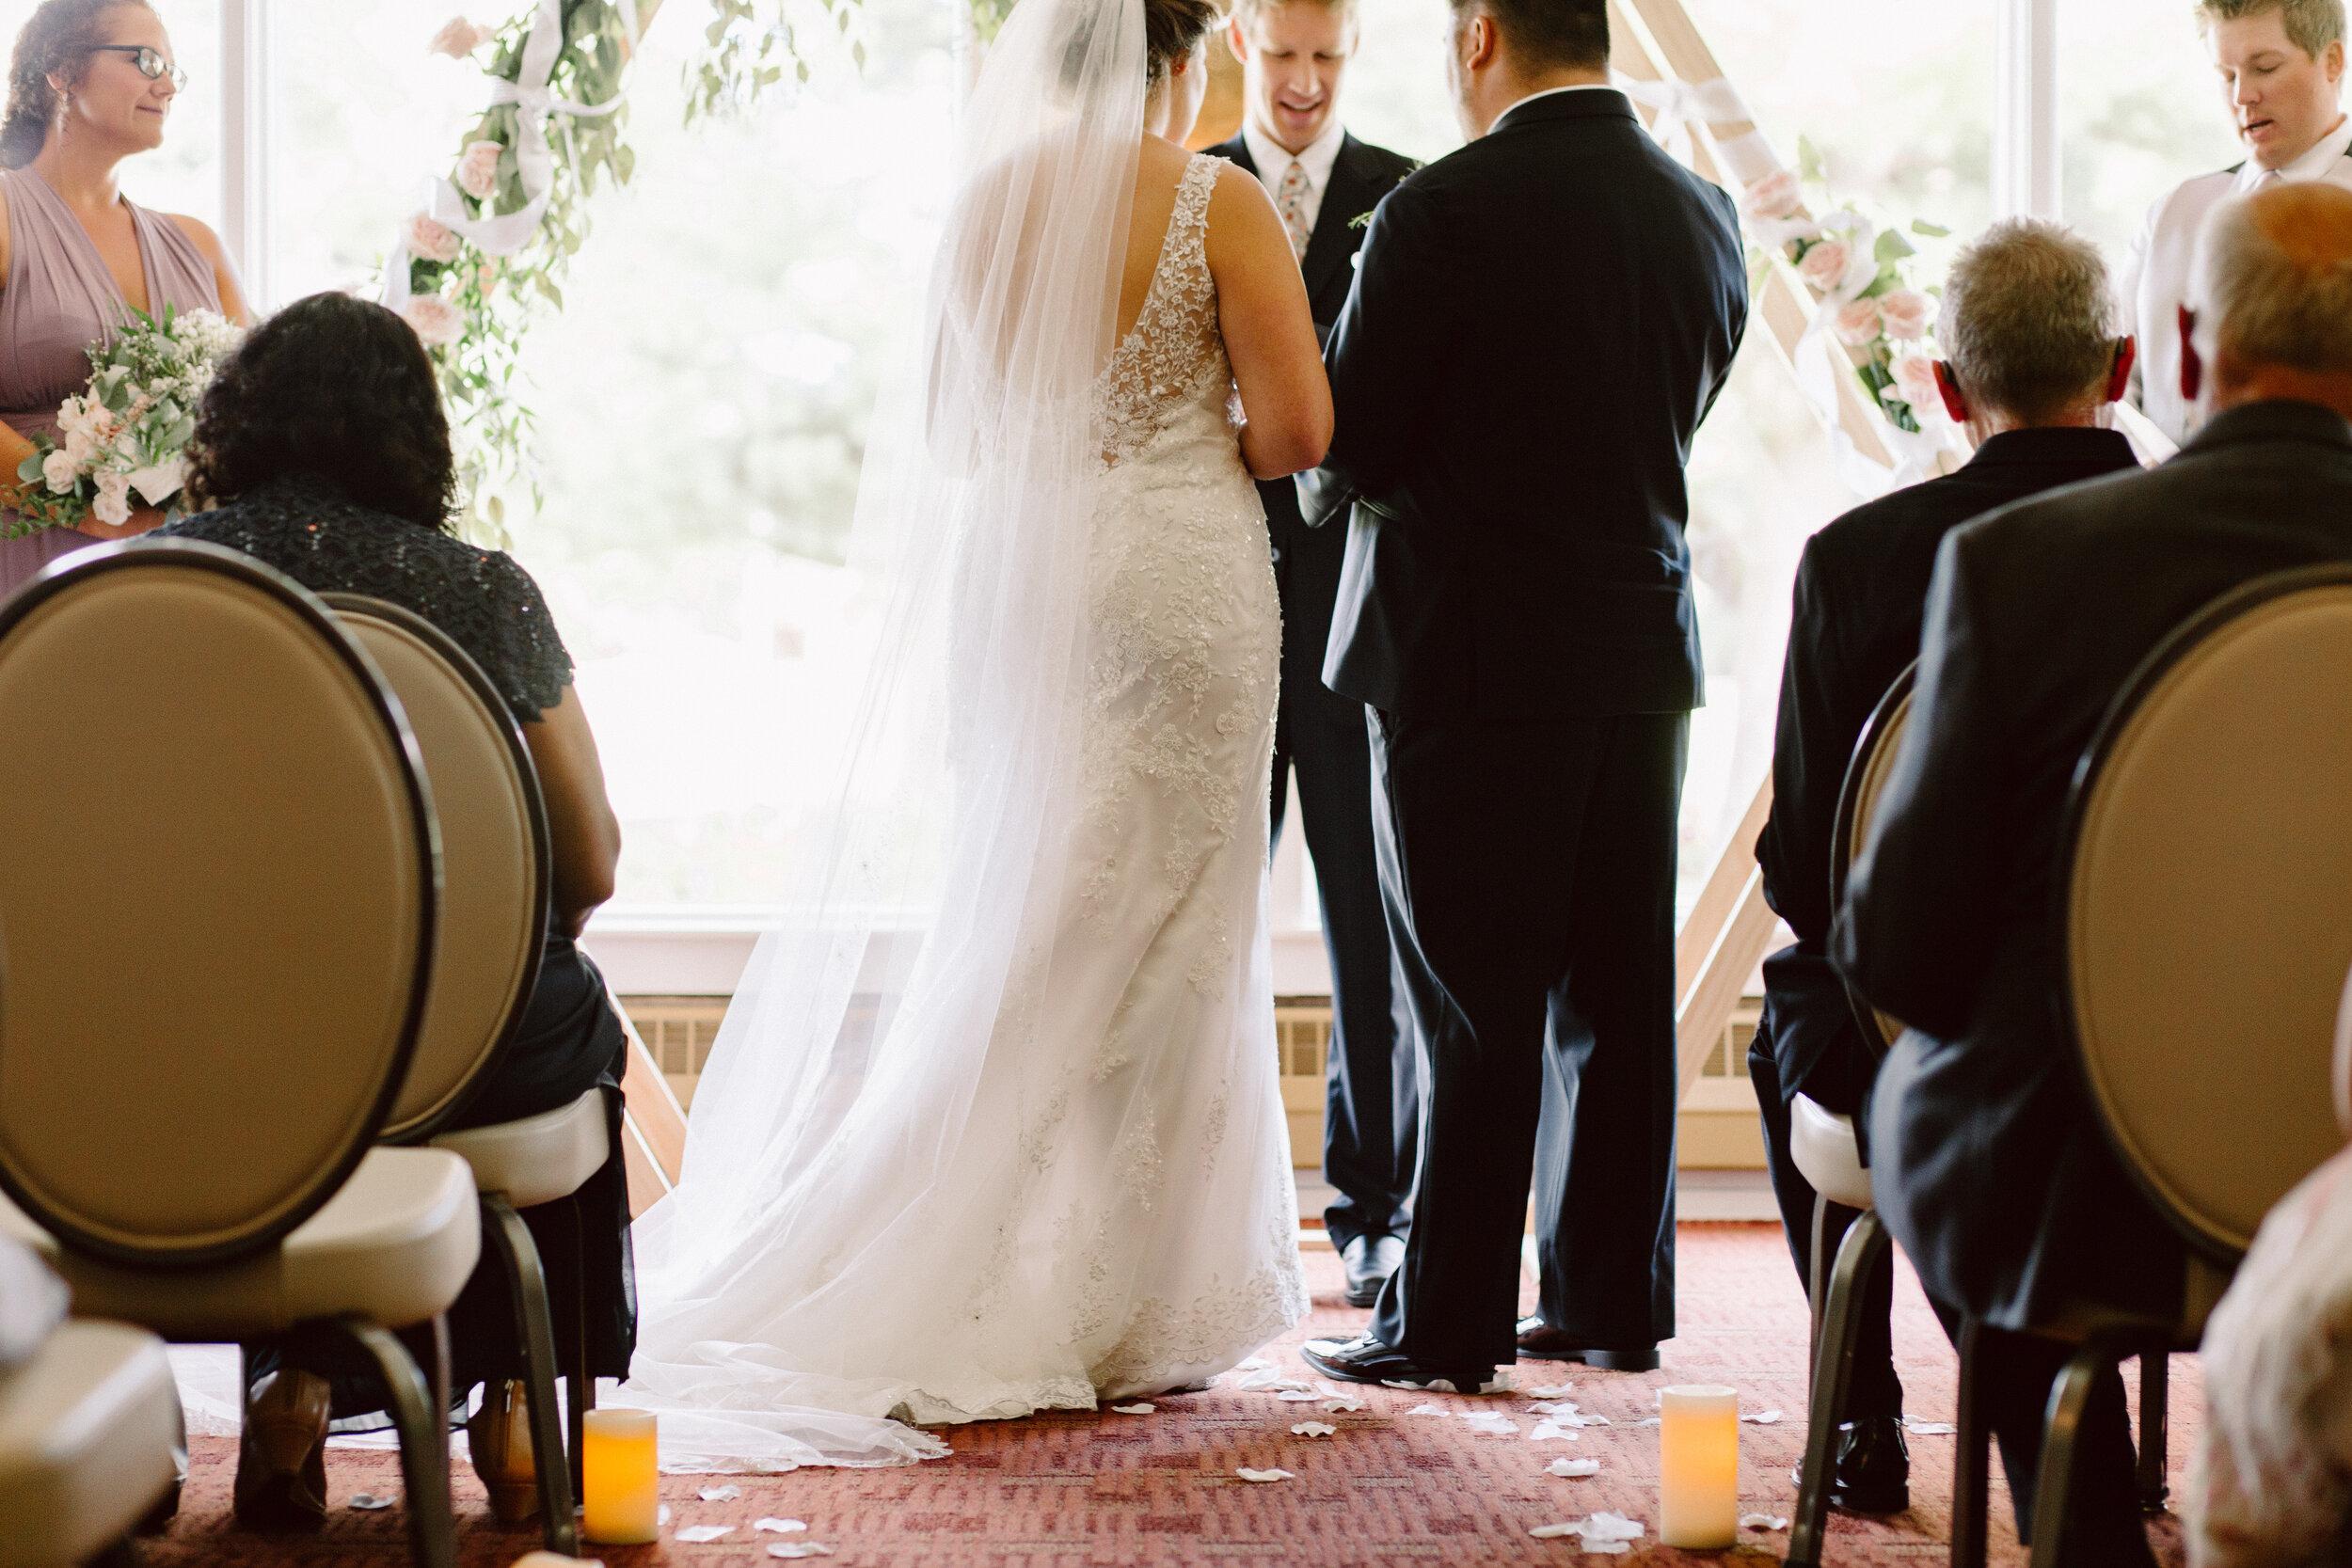 S&B Wedding - Ceremony-60.jpg